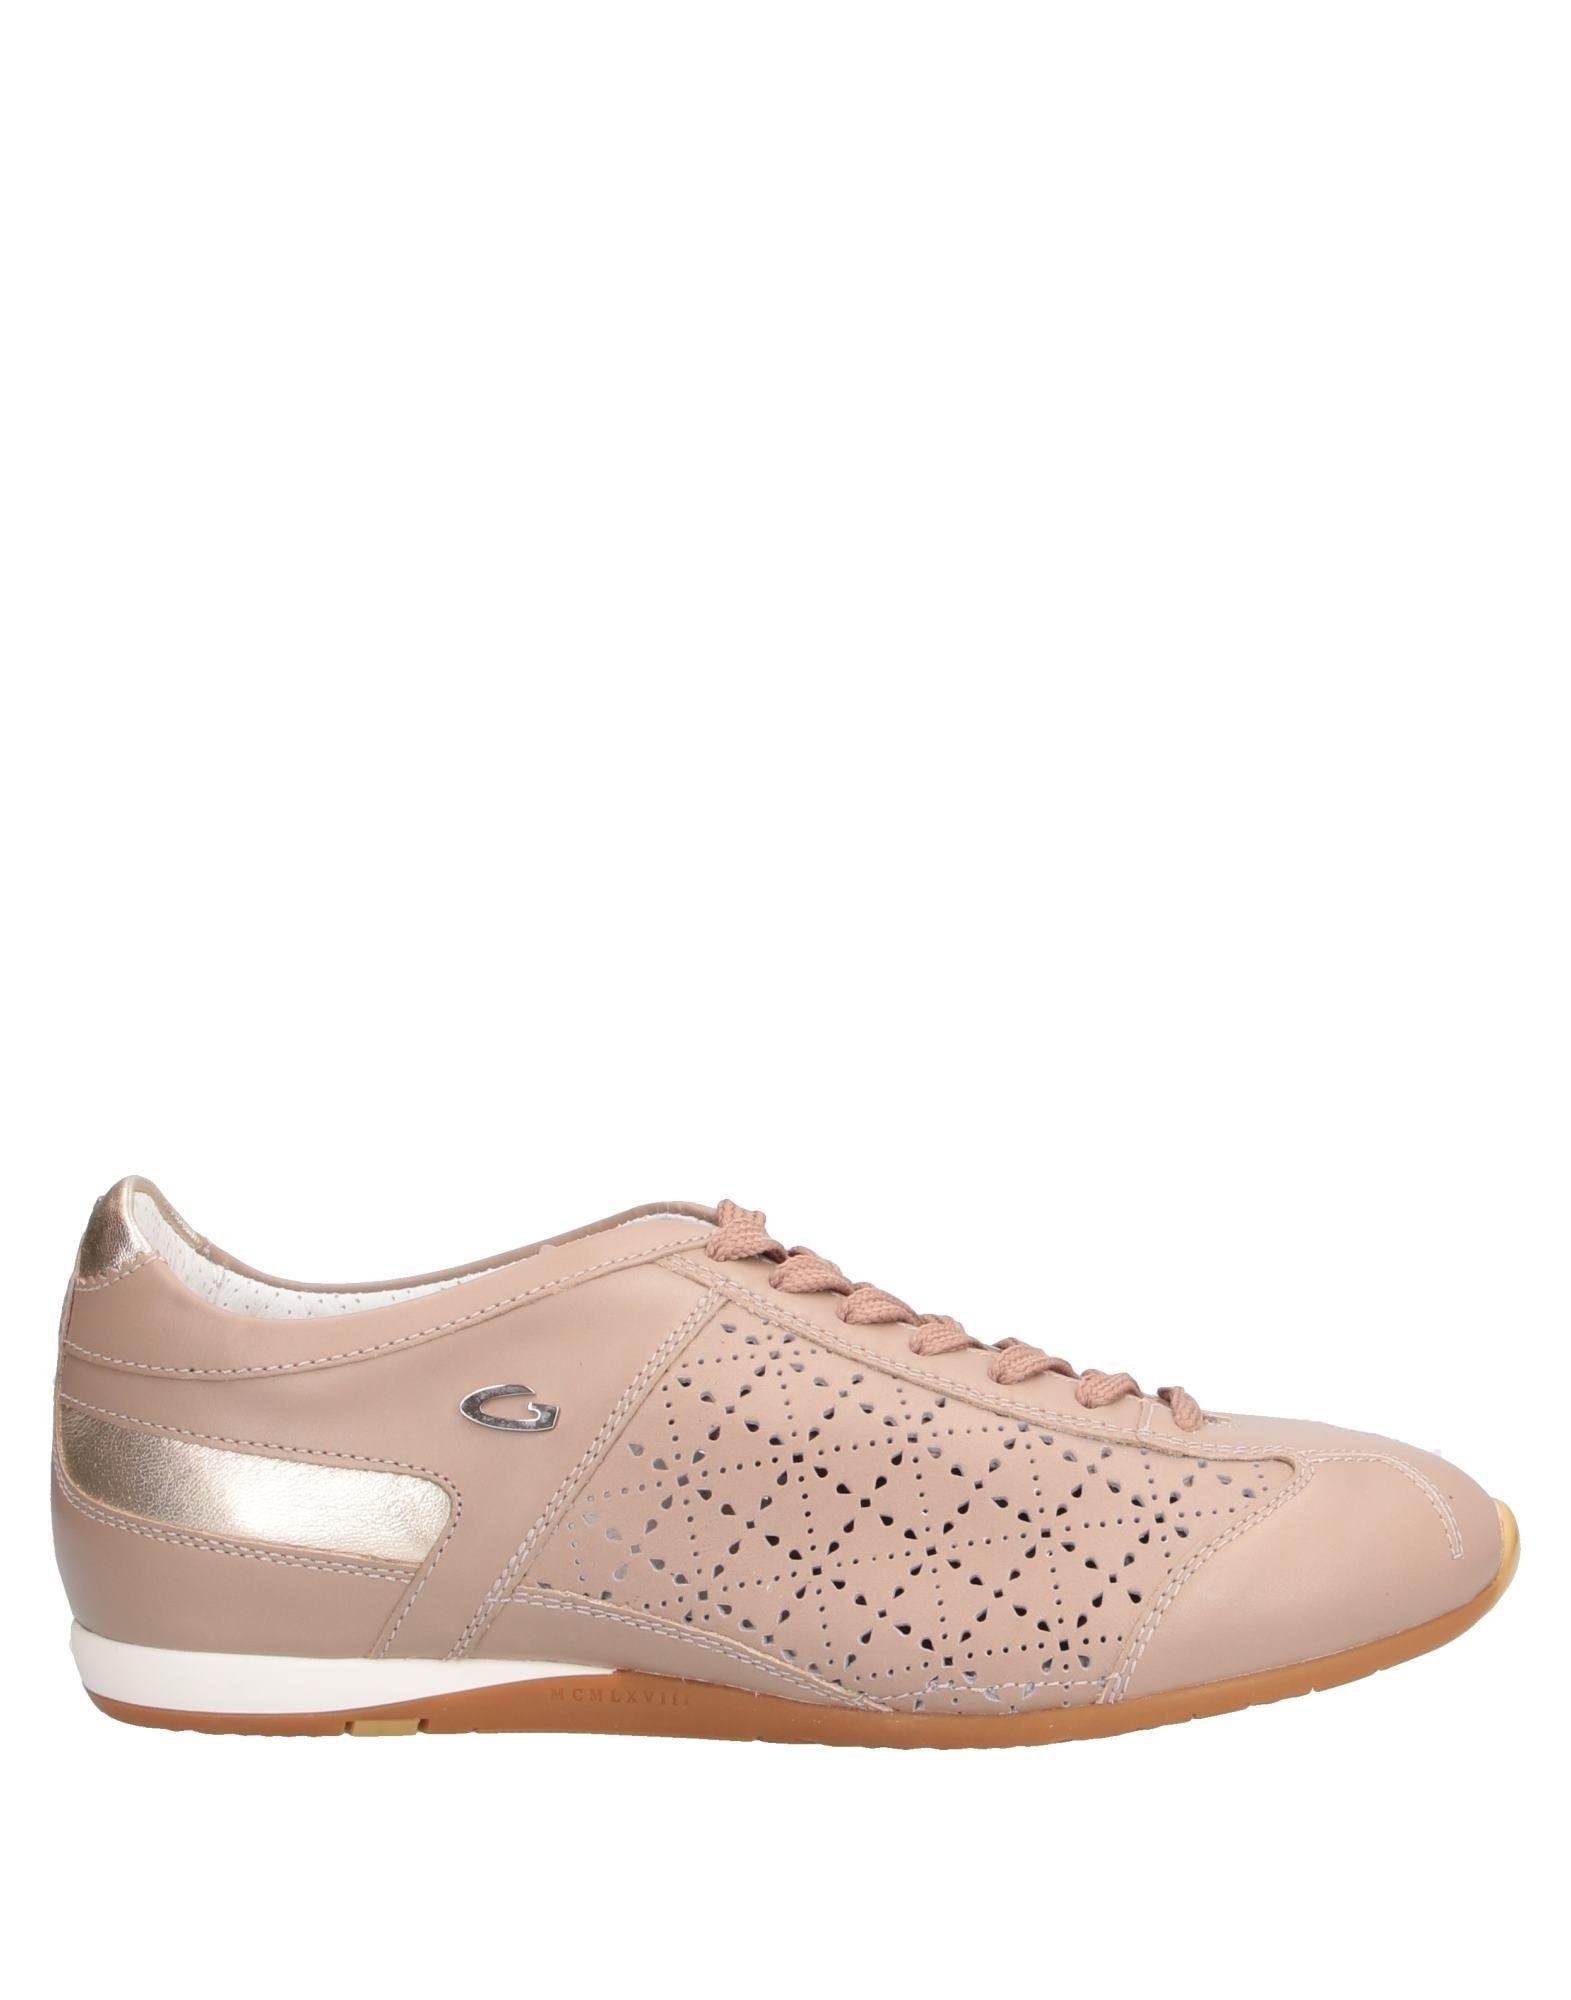 ALBERTO GUARDIANI | ALBERTO GUARDIANI Low-tops & sneakers | Goxip